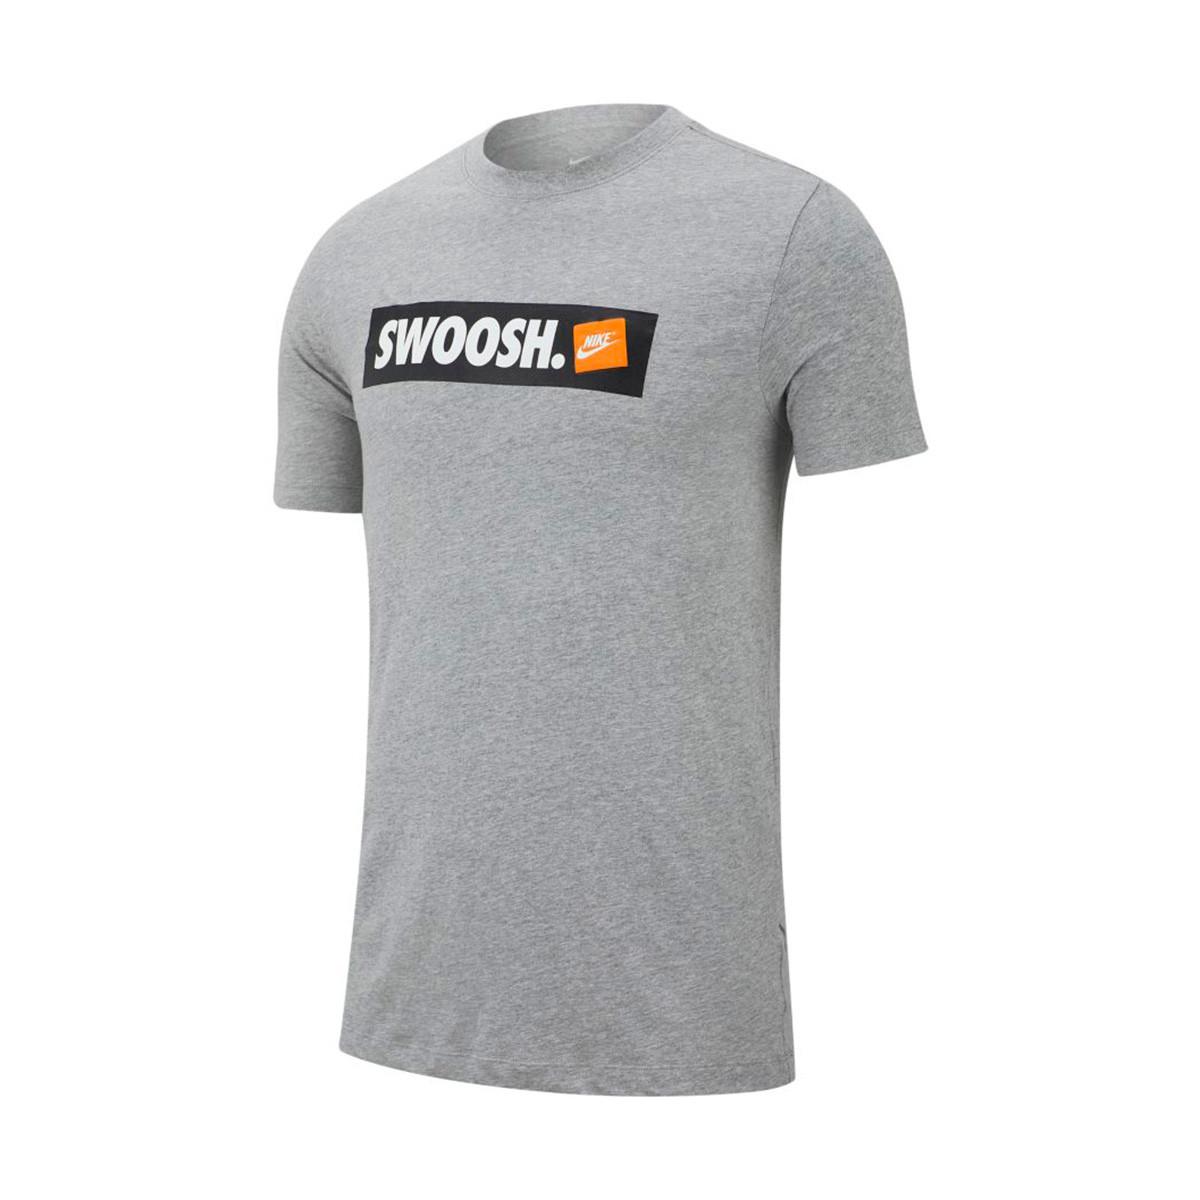 d869a7ab7b8f8 Jersey Nike Sportswear Swoosh Dark grey heather-White - Tienda de fútbol  Fútbol Emotion